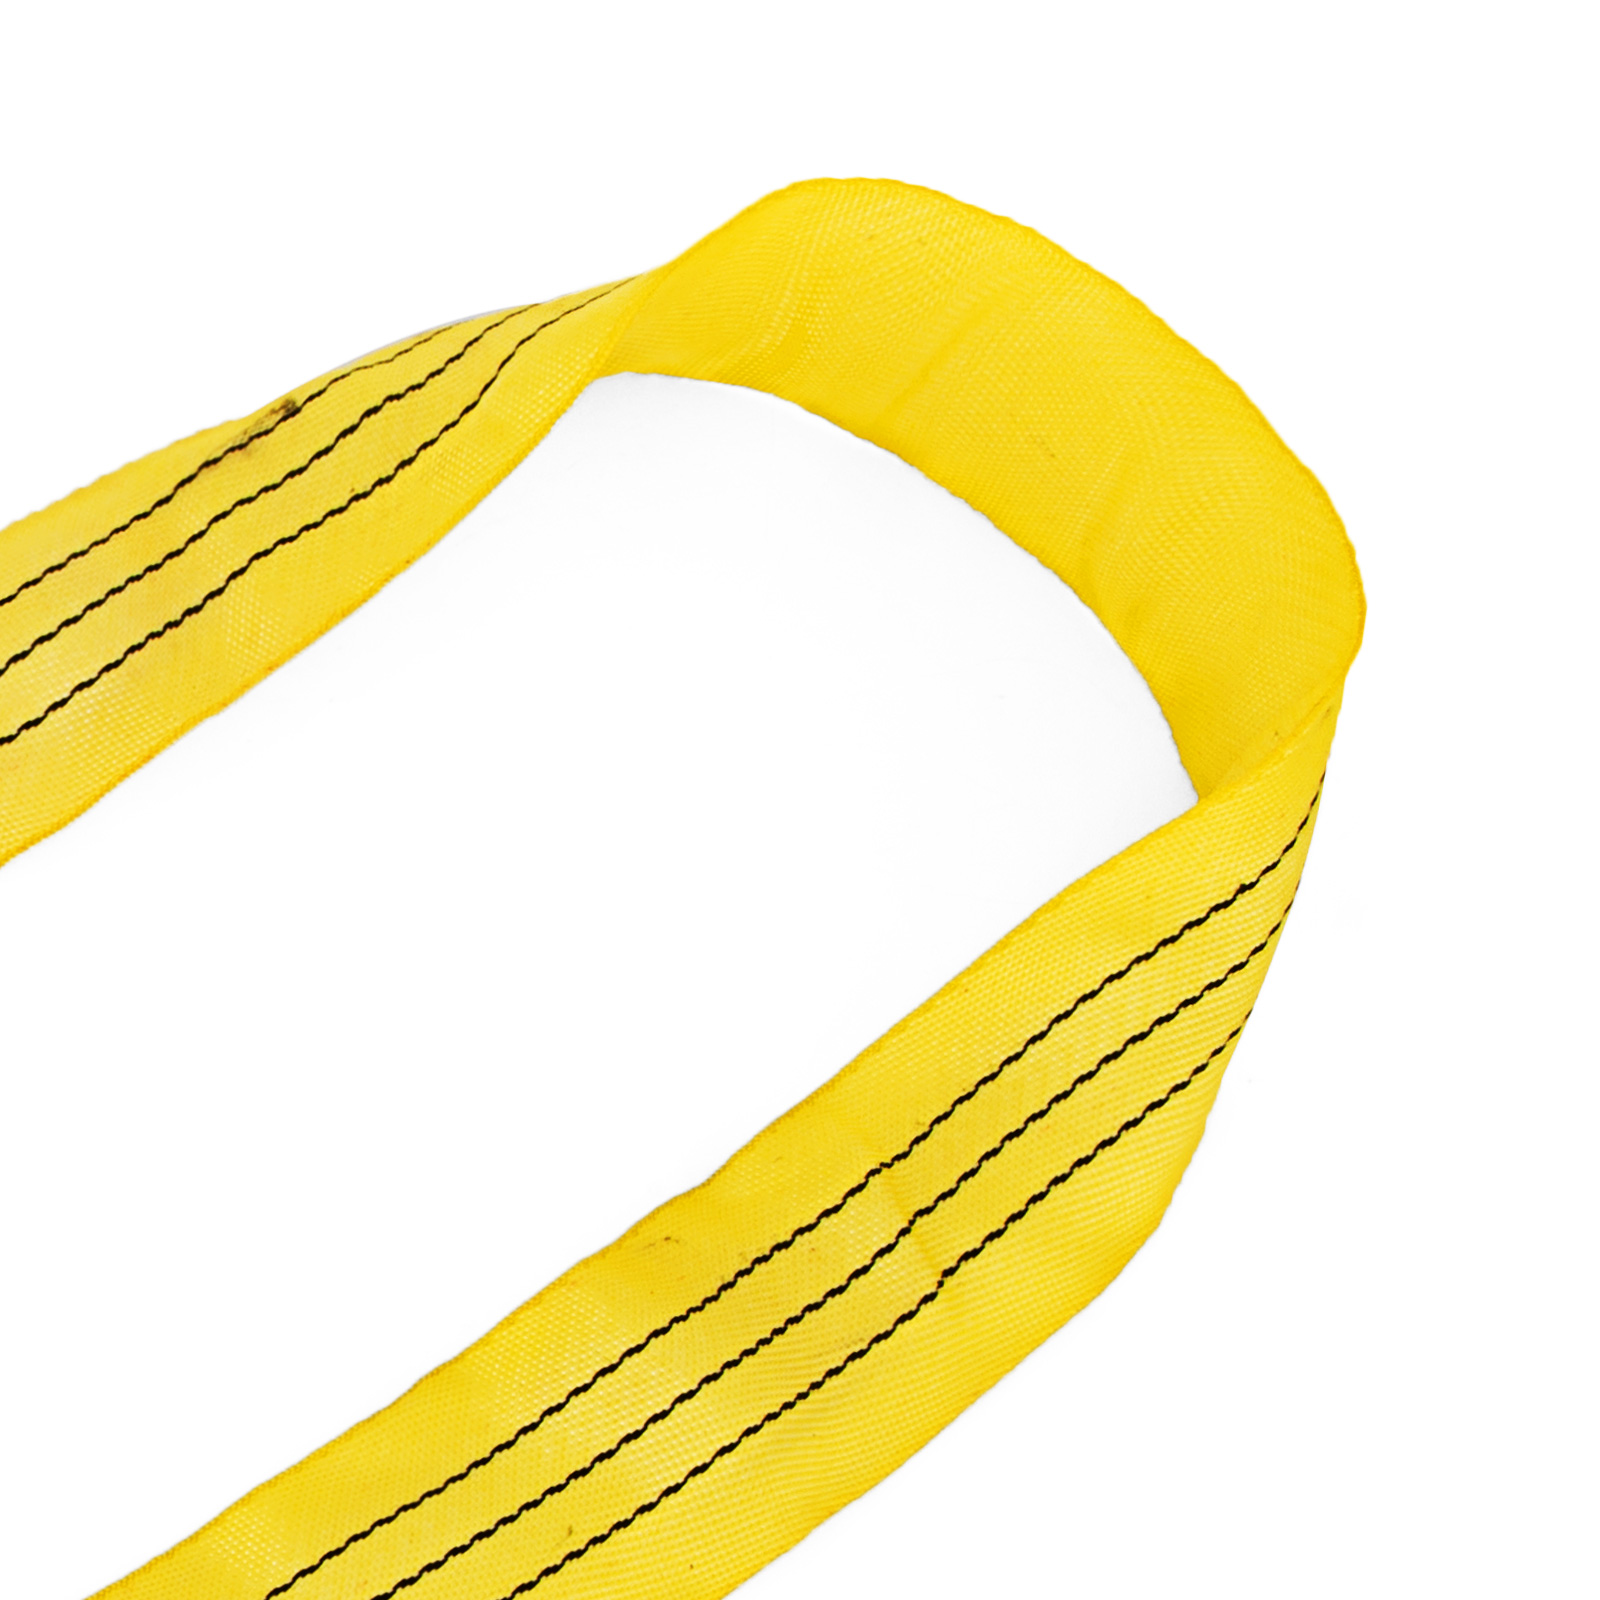 2PCS 6Ft Perimeter 6600lbs Endless Round Lifting Sling Strap 1.8M//6ft Yellow